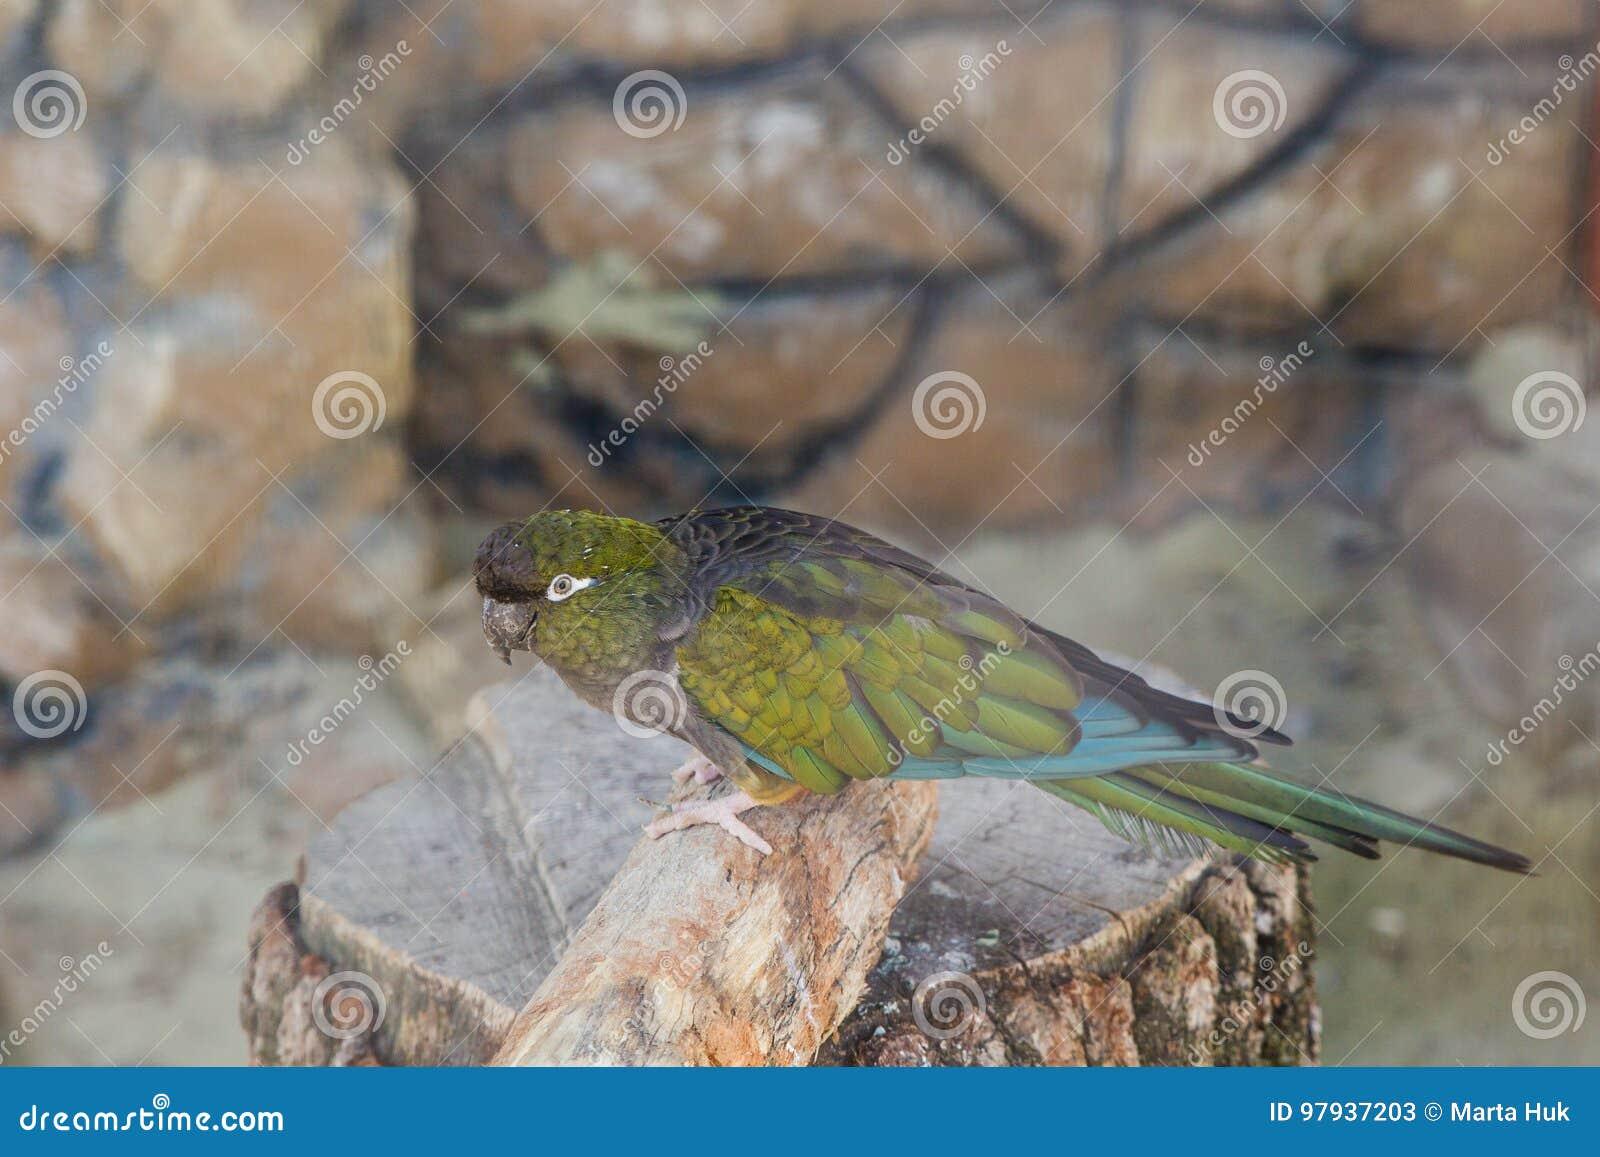 Kolorowa papuga w klatce w zoo